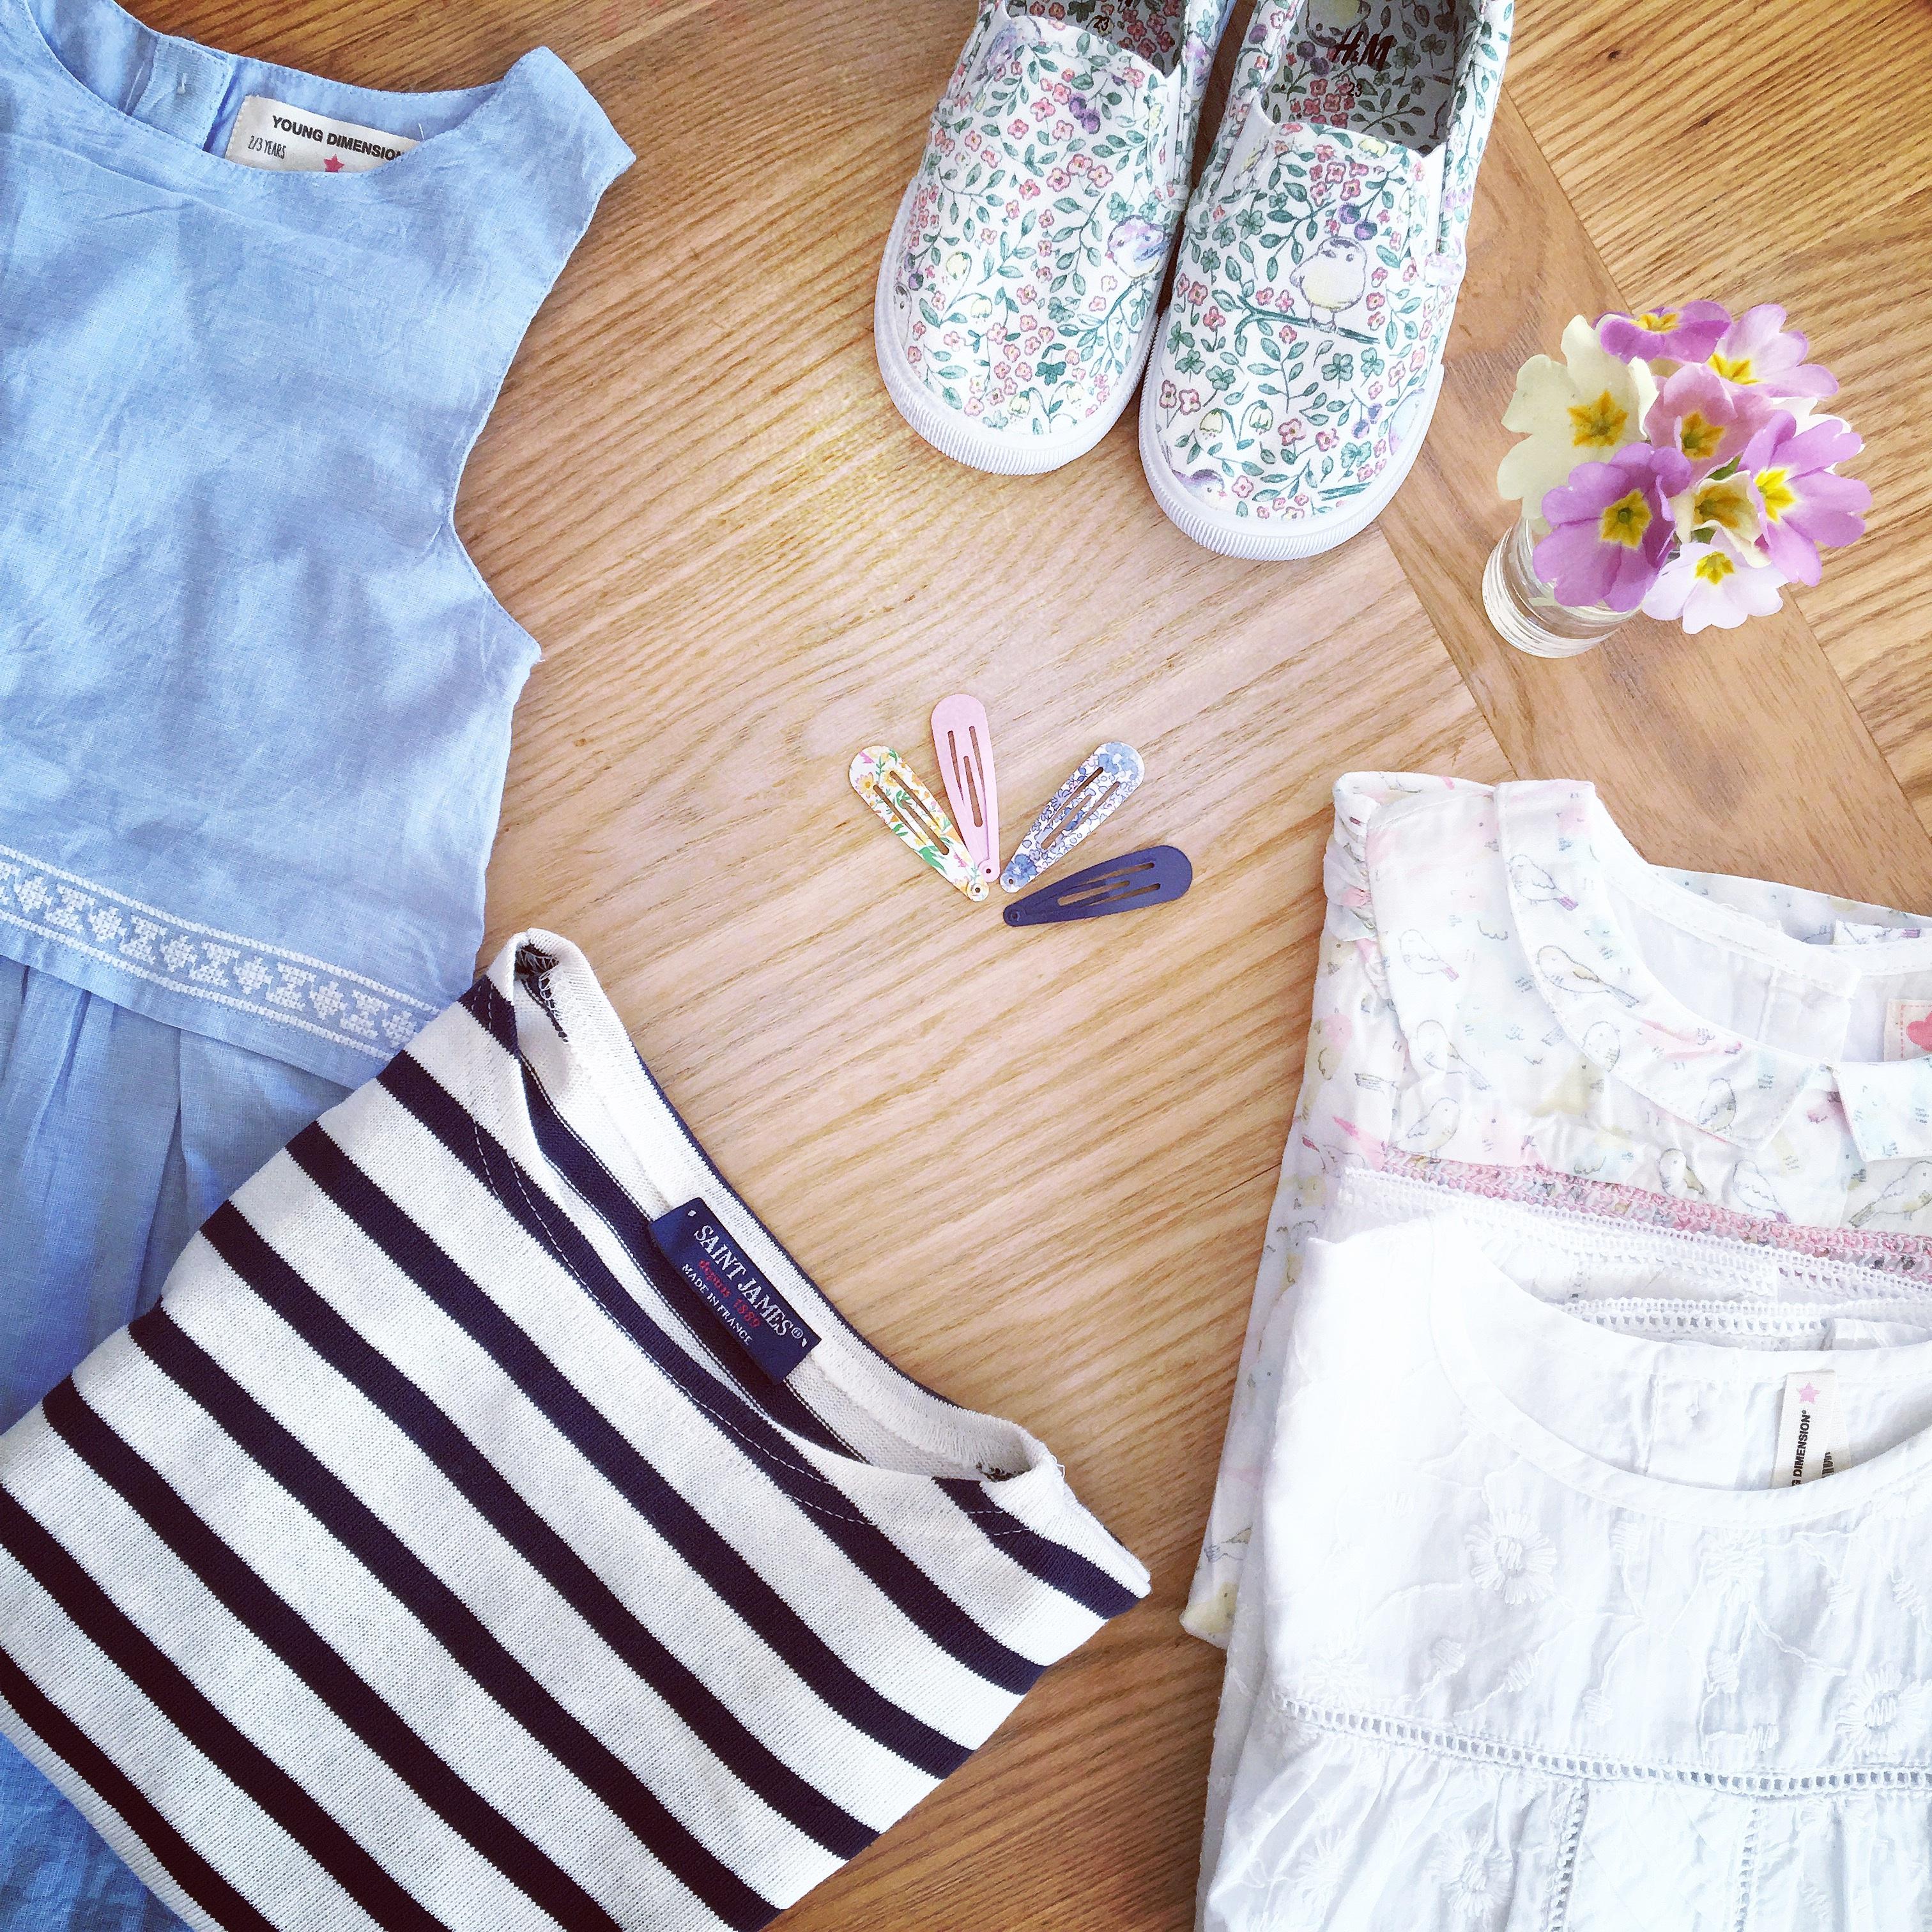 sepatu pola musim semi pakaian bunga bunga produk tekstil gadis gaun celana pendek lemari pakaian